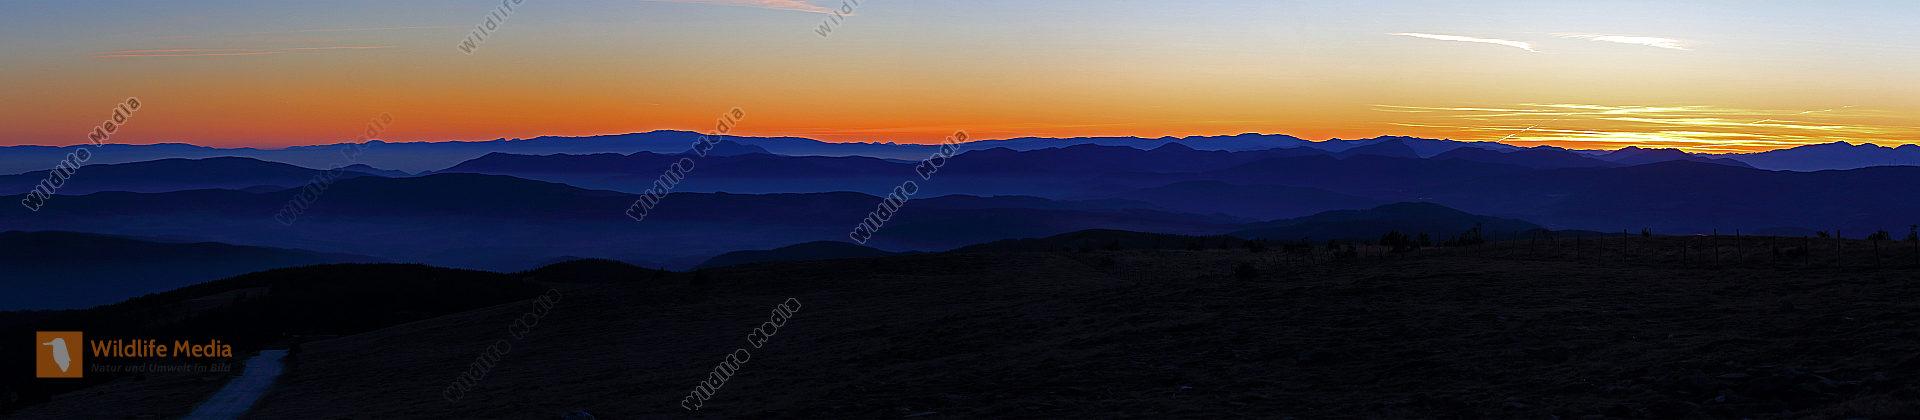 Hochwechsel Panorama Sonnenuntergang